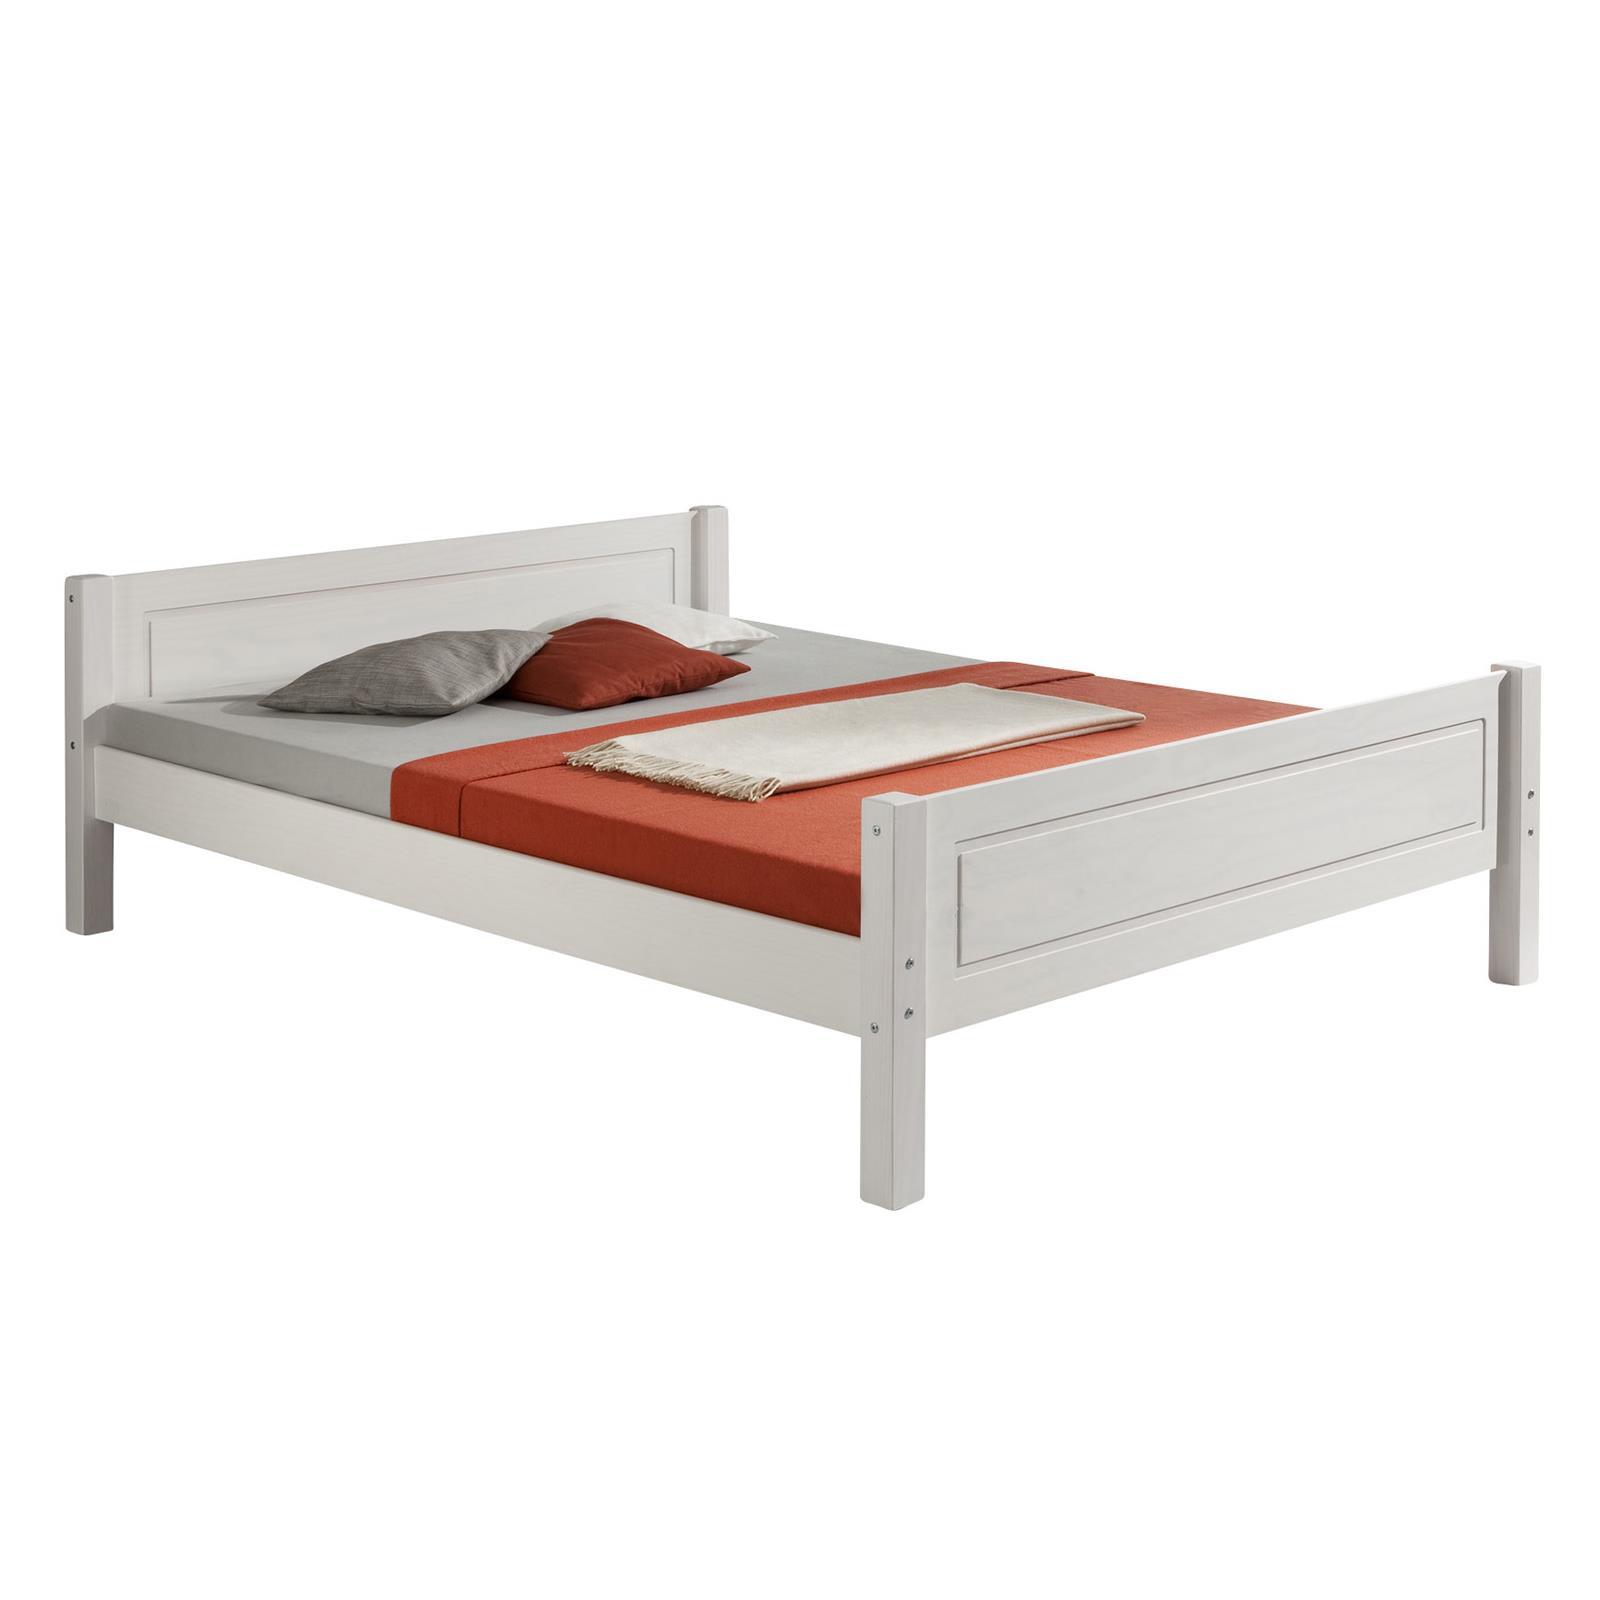 Doppelbett Größen : Holzbett einzelbett doppelbett landhausbett kiefer in